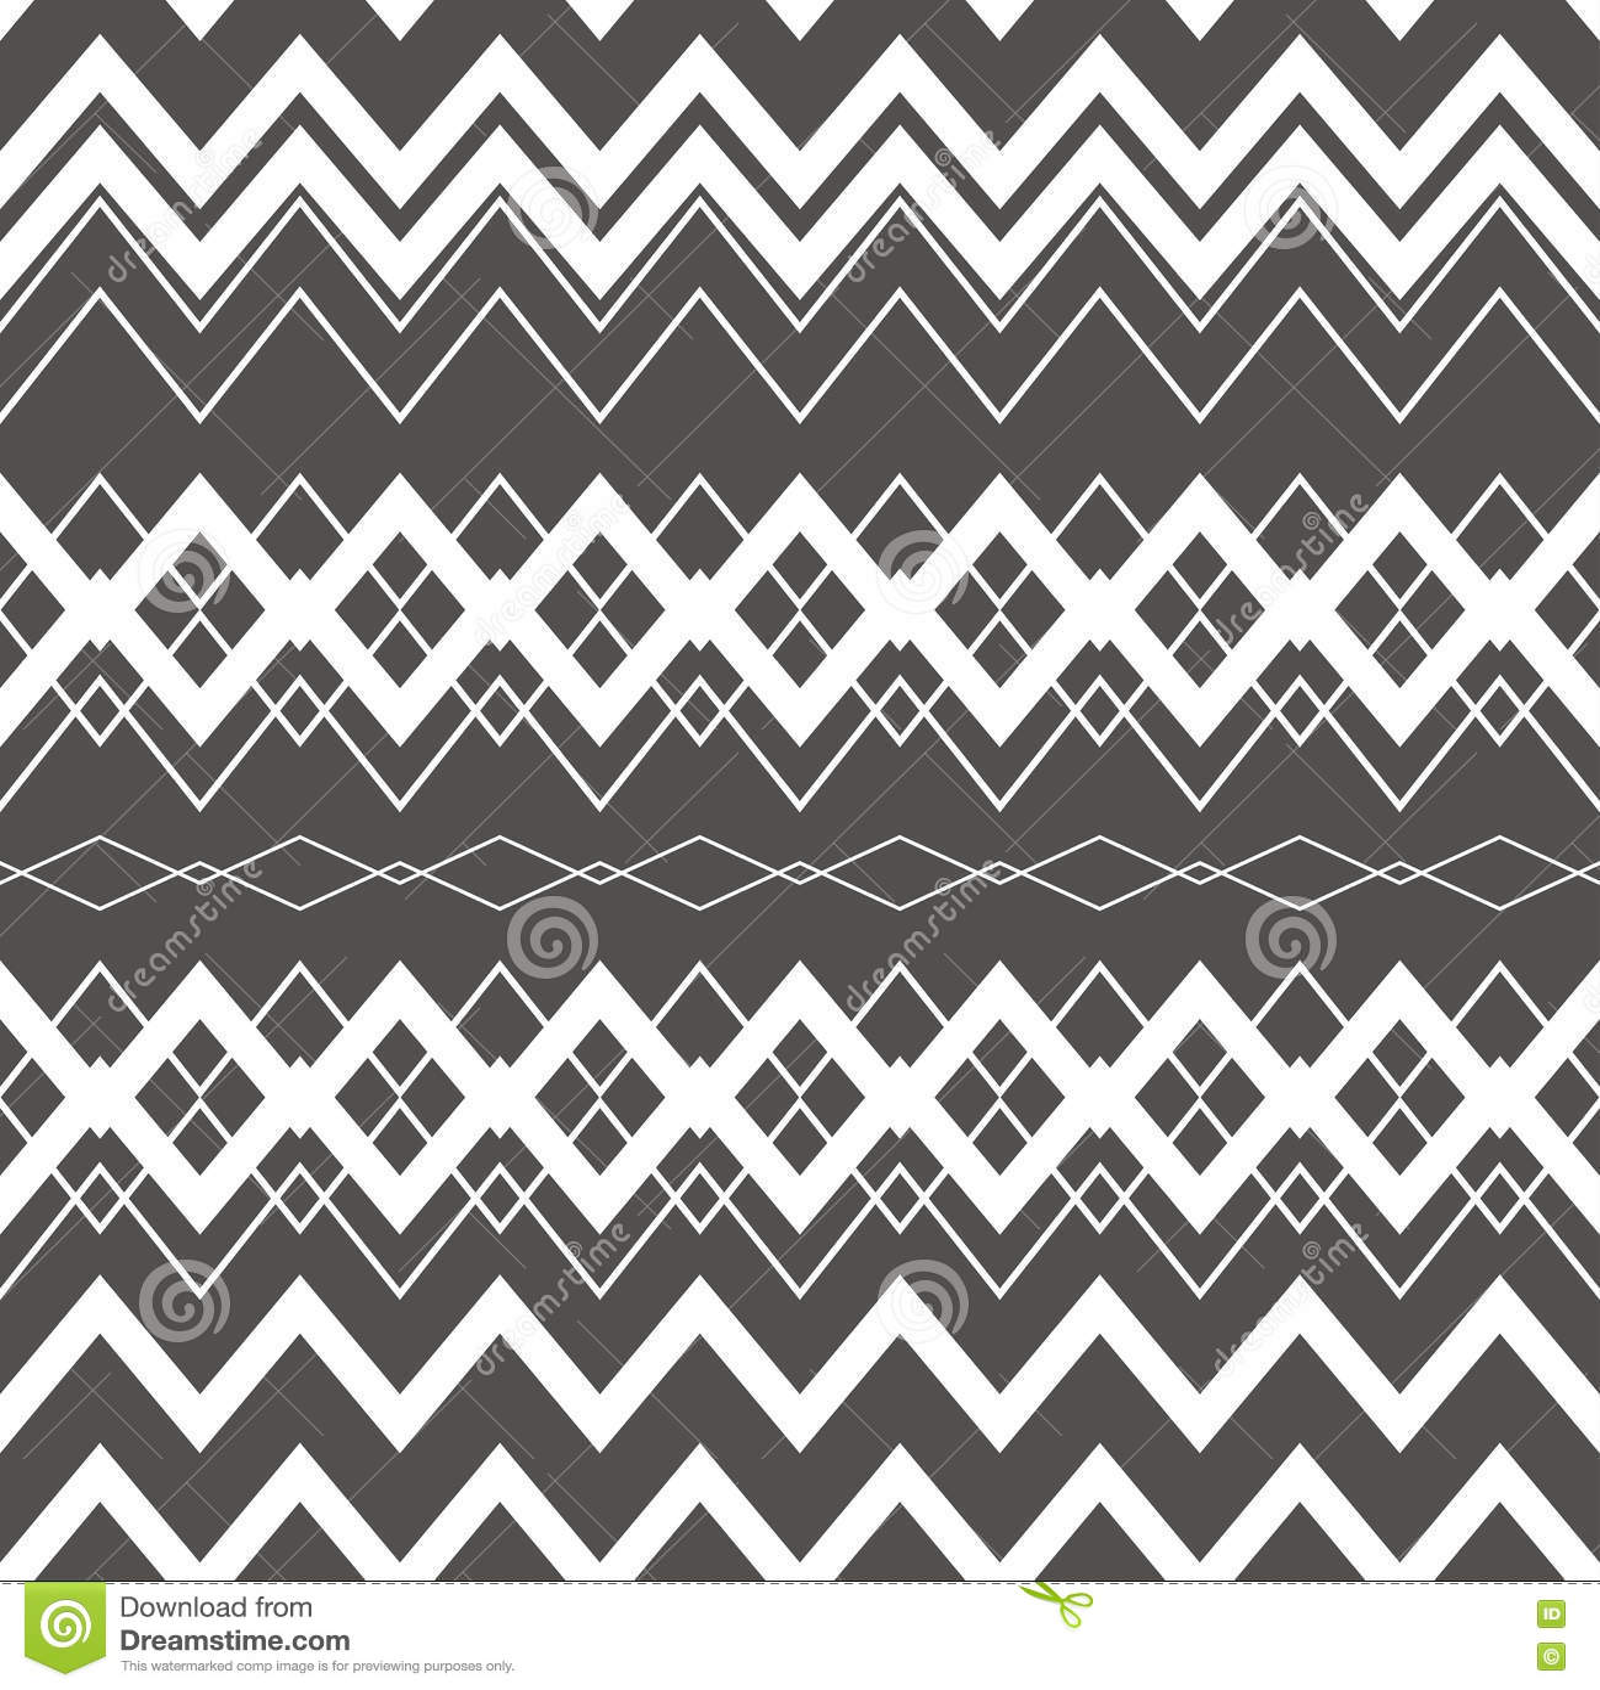 Tribal Boho Seamless Pattern Ethnic Geometric Ornament